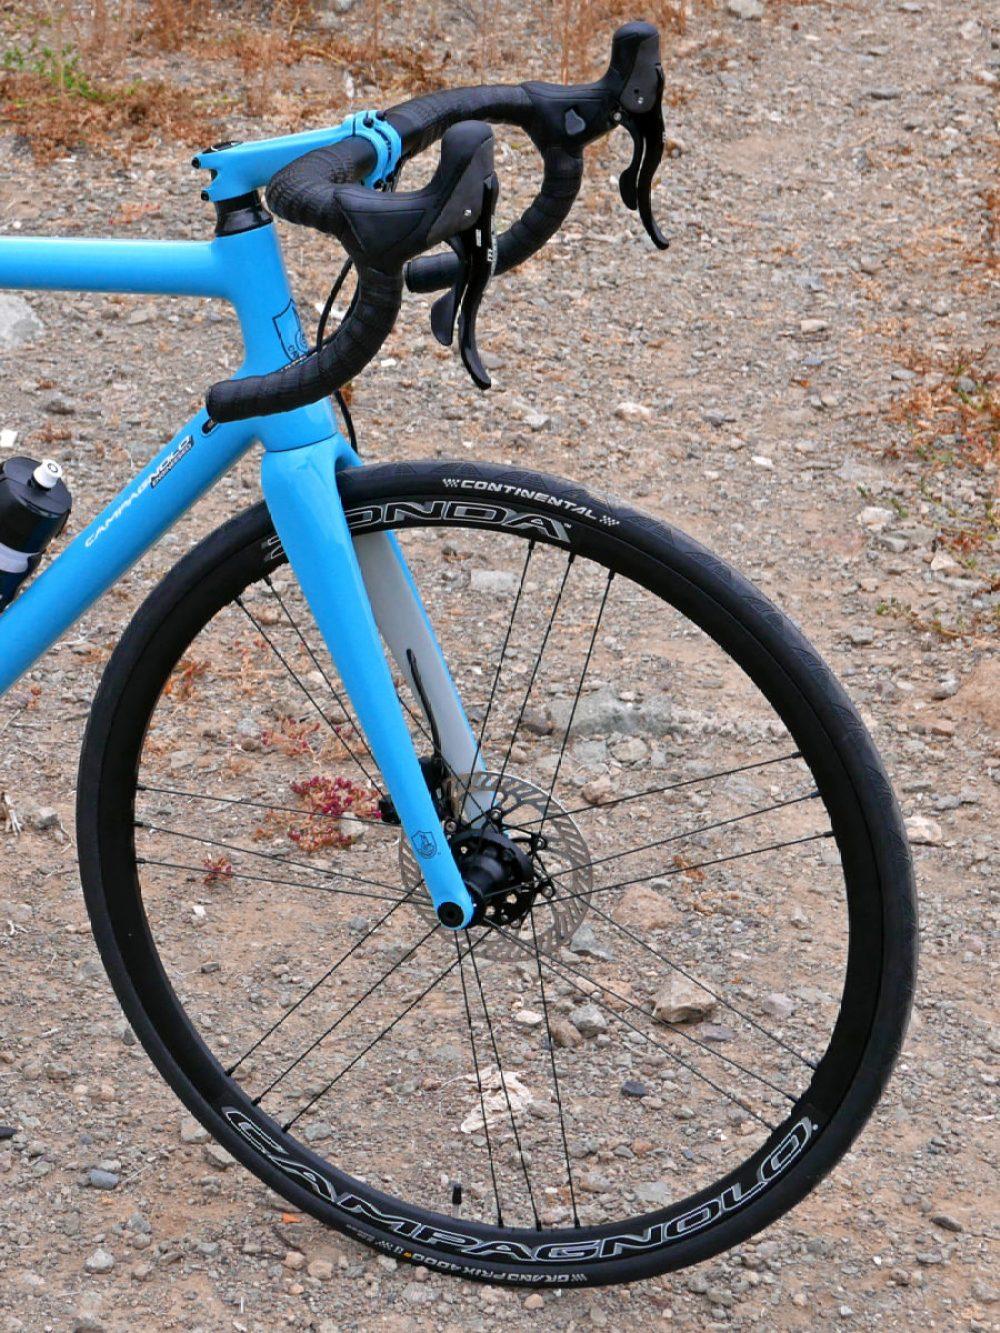 Campagnolo-Potenza-11-HO-hydraulic-optimized_mid-level-11-speed-aluminum-road-disc-brake-groupset_Zonda-DB-wheels